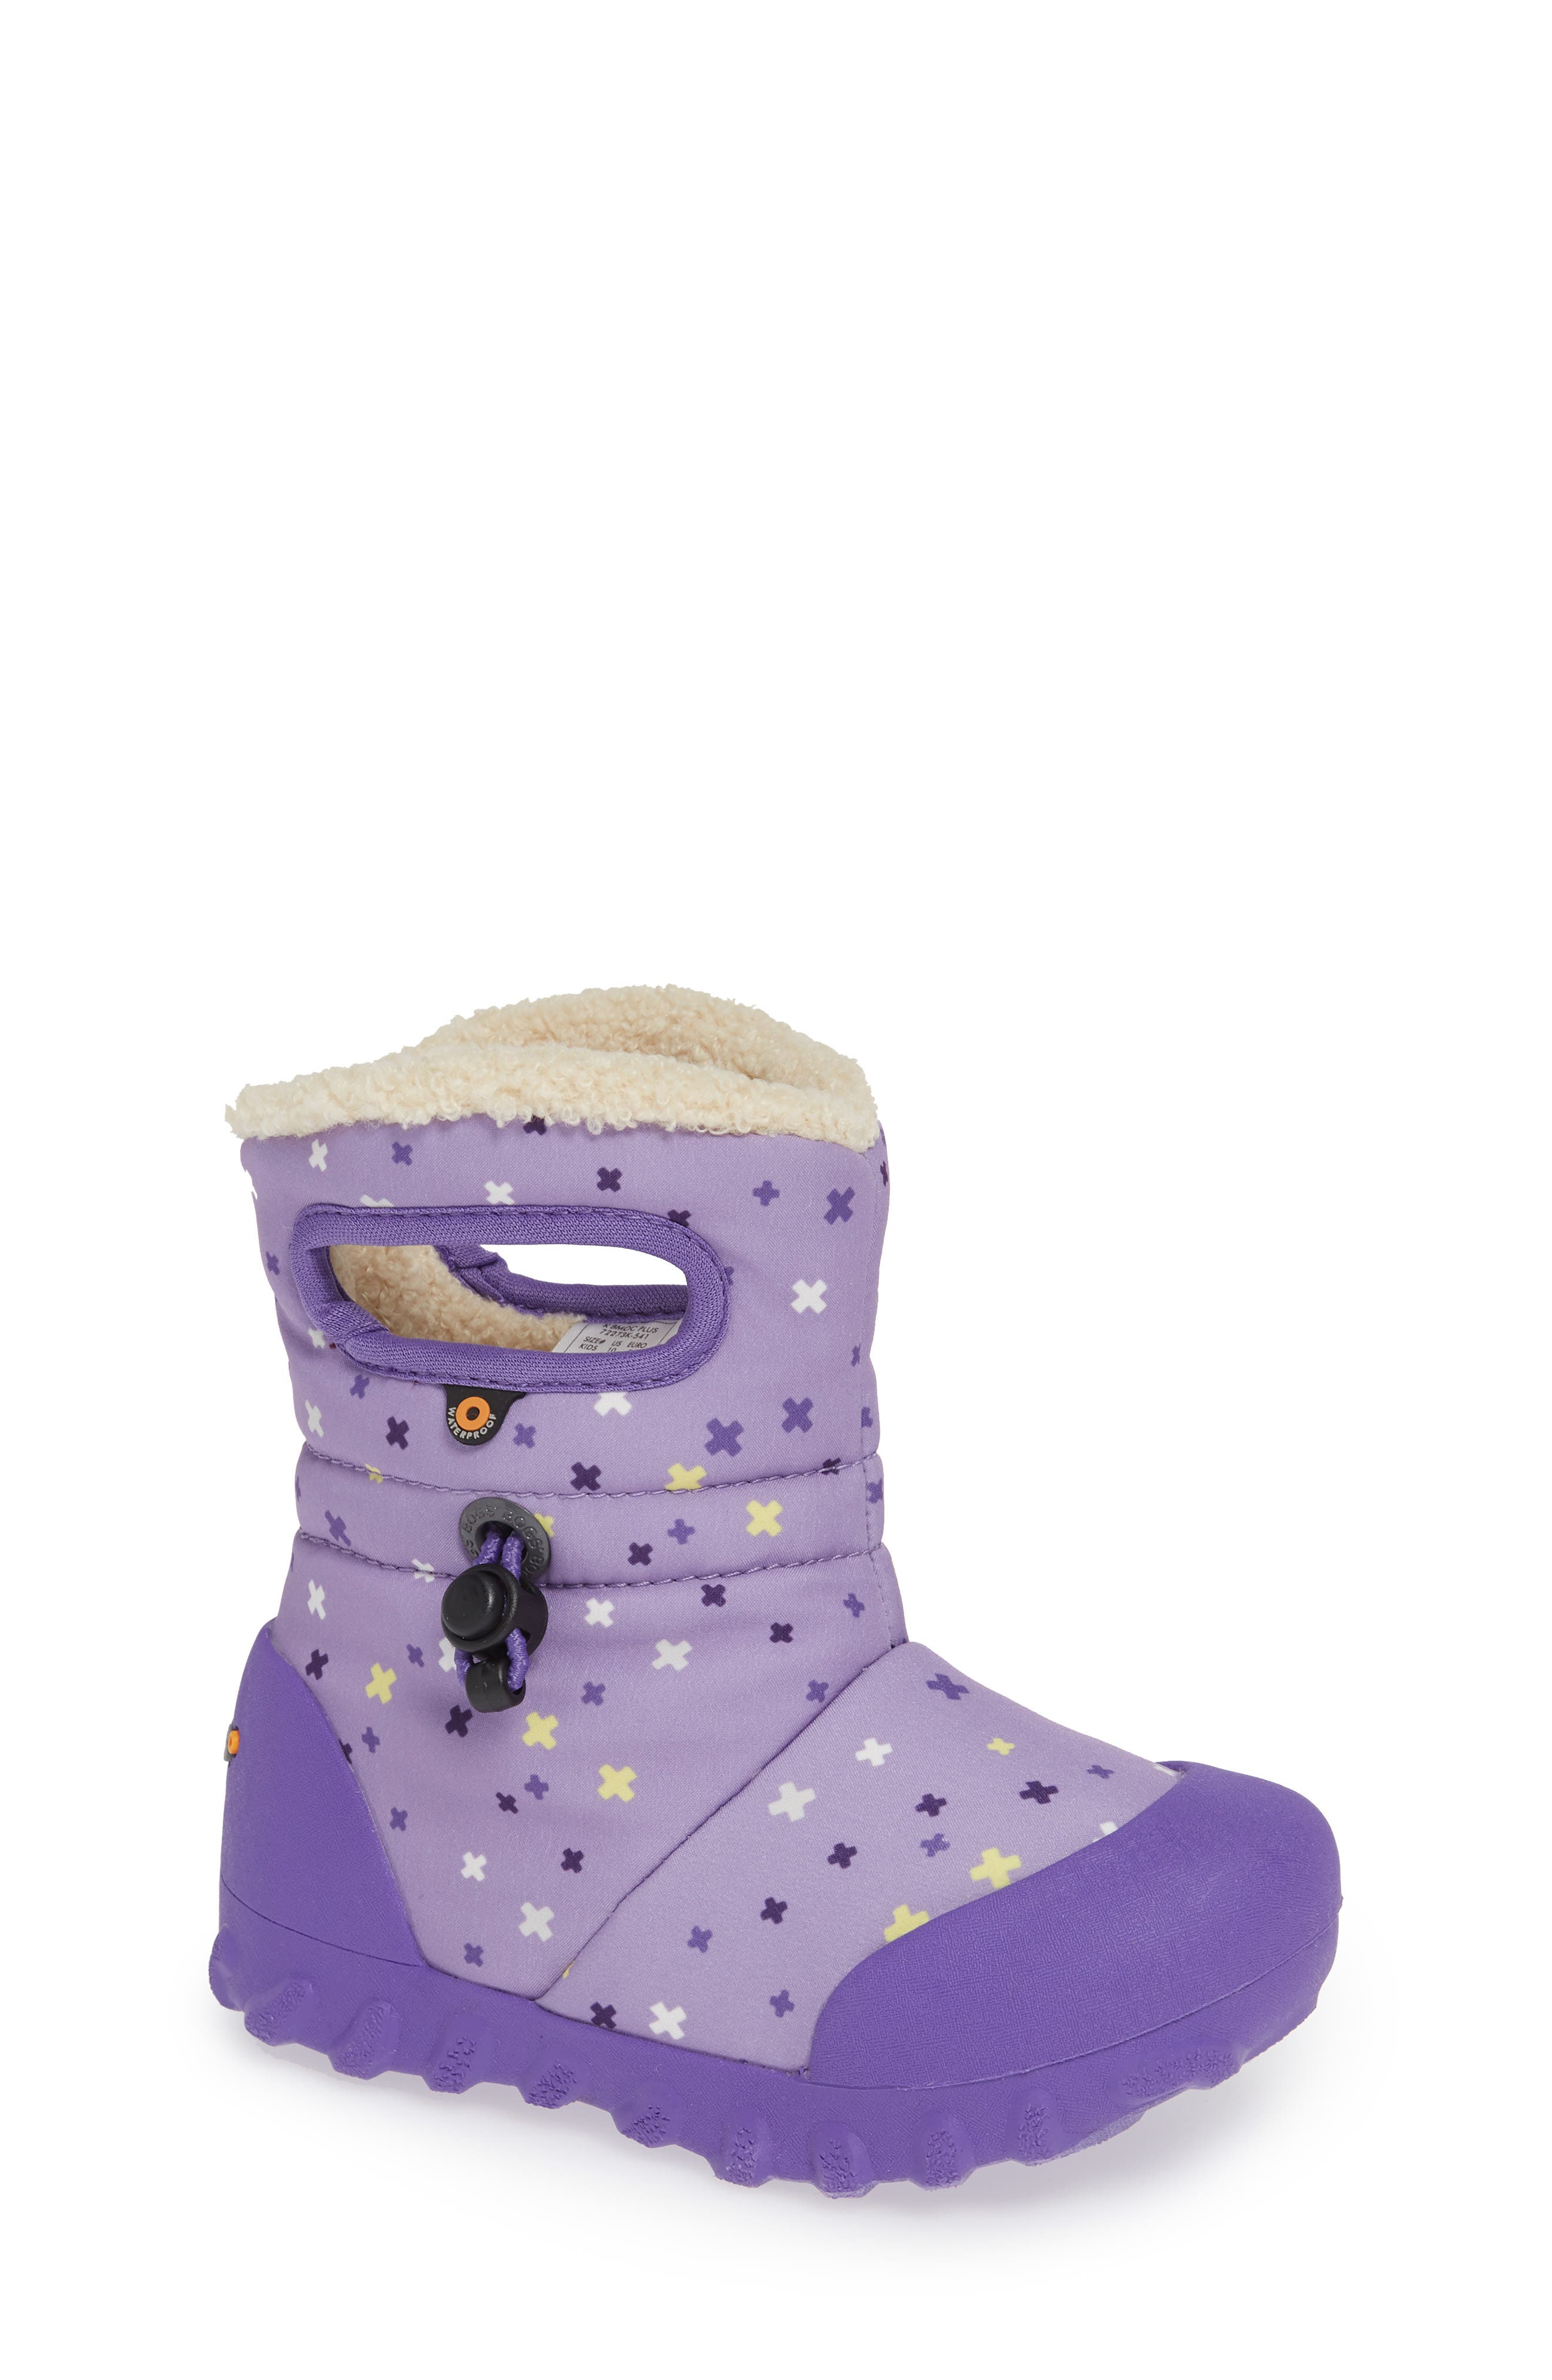 Bogs B-Moc Plus Waterproof Insulated Faux Fur Boot